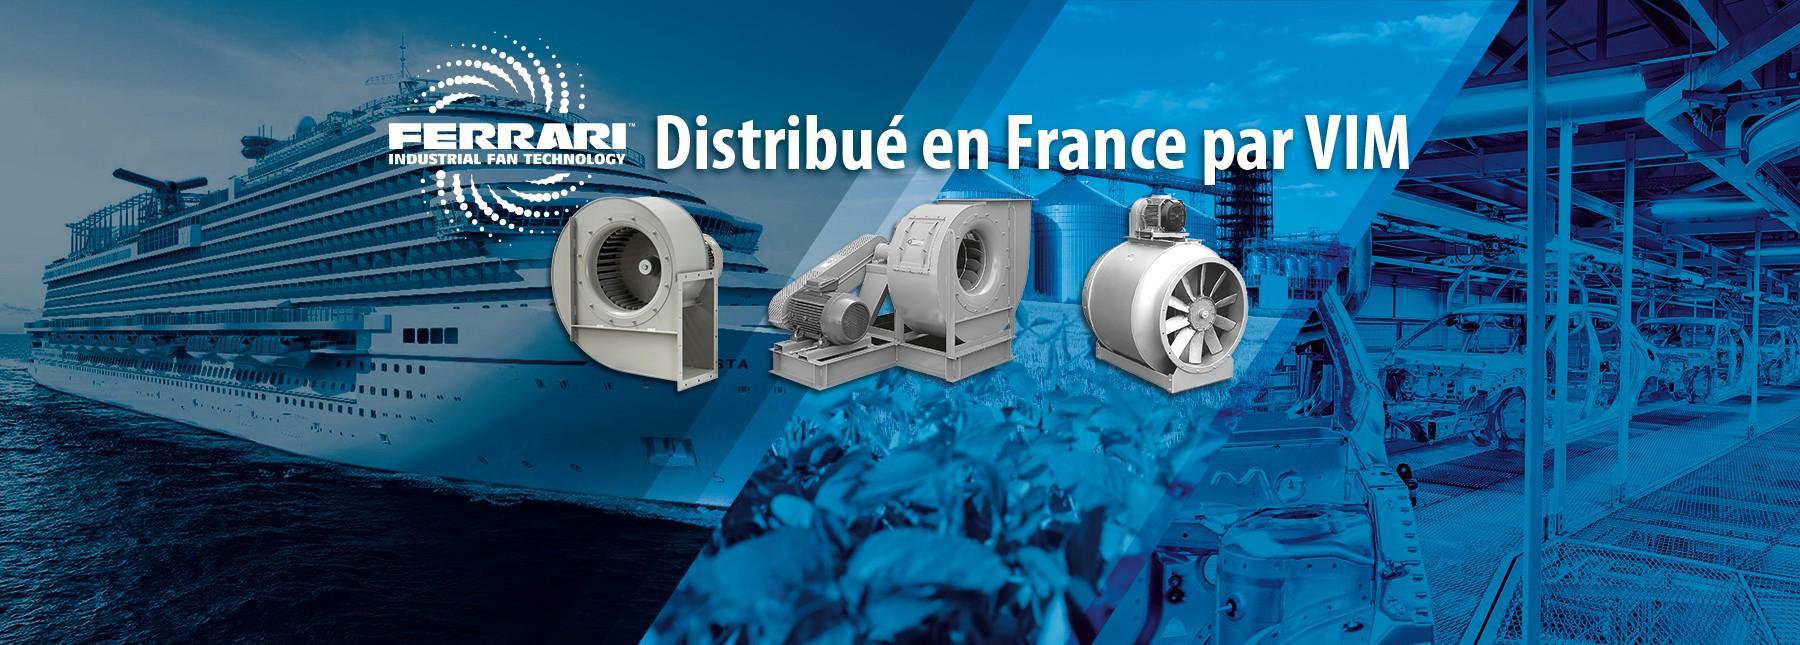 FERRARI Ventilatori France